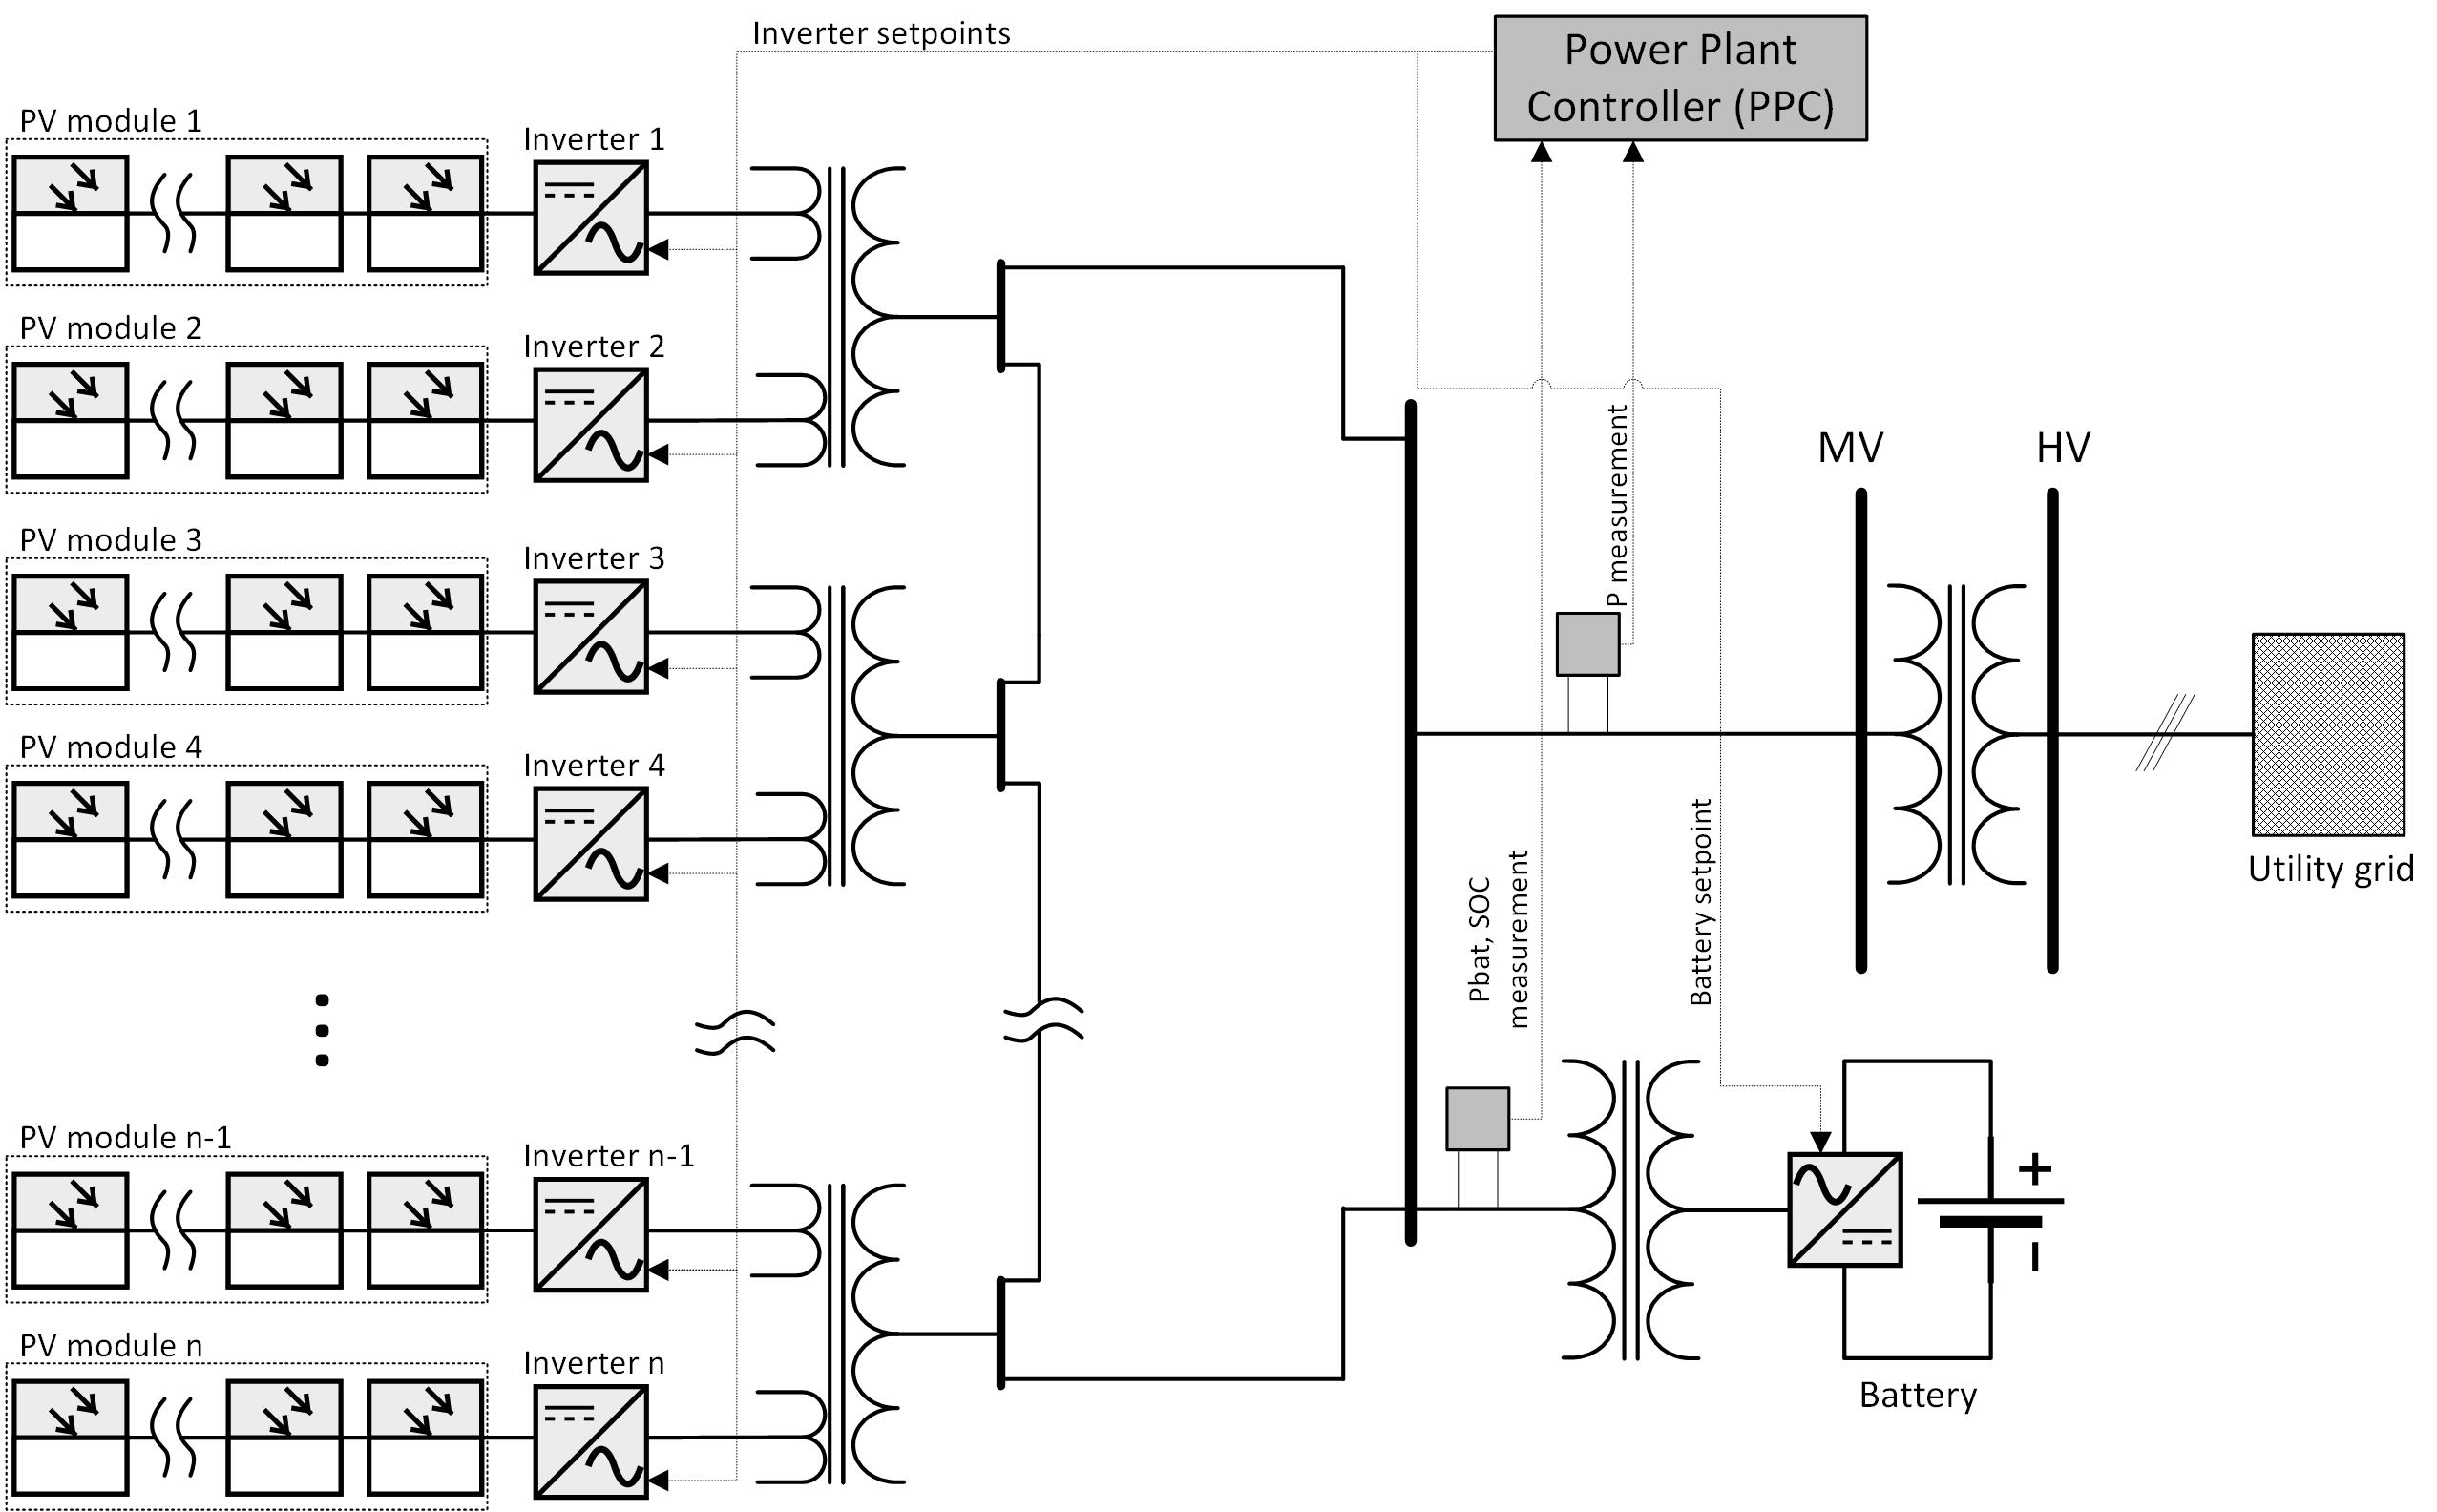 visio electrical diagram xs650 wiring chopper photovoltaics flowchart in microsoft